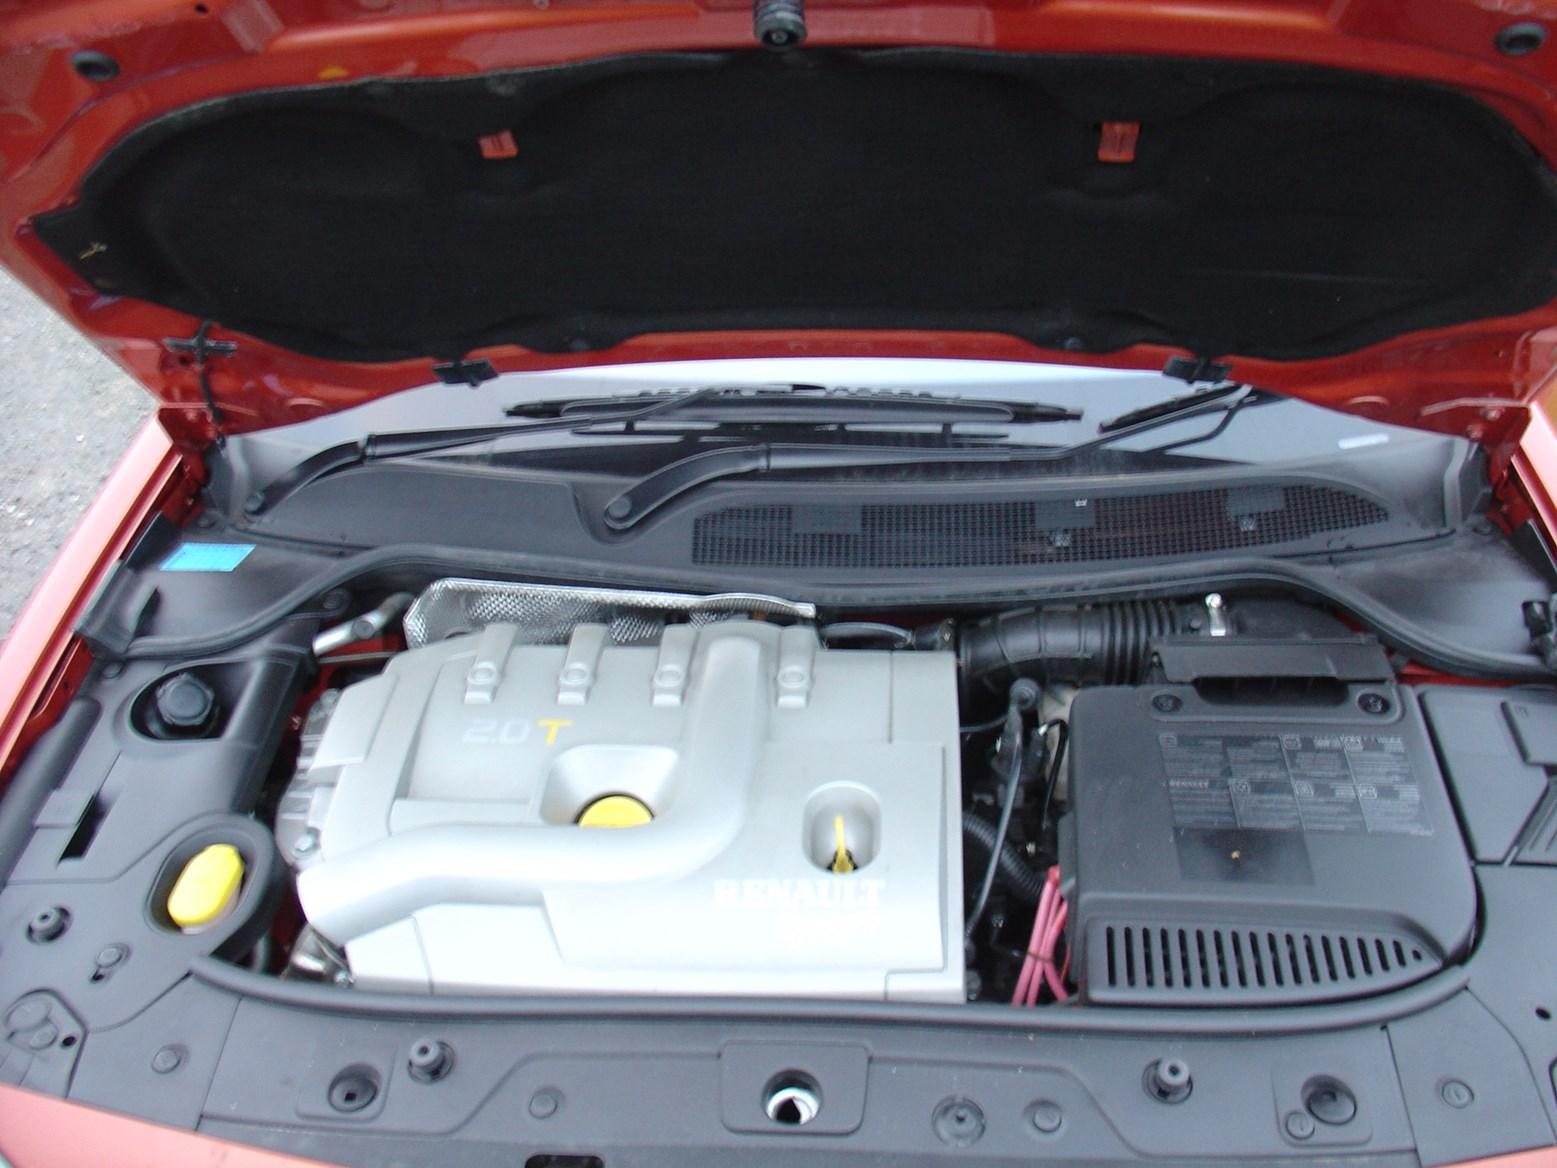 Renault Megane Hatchback 2002 2006 Features Equipment